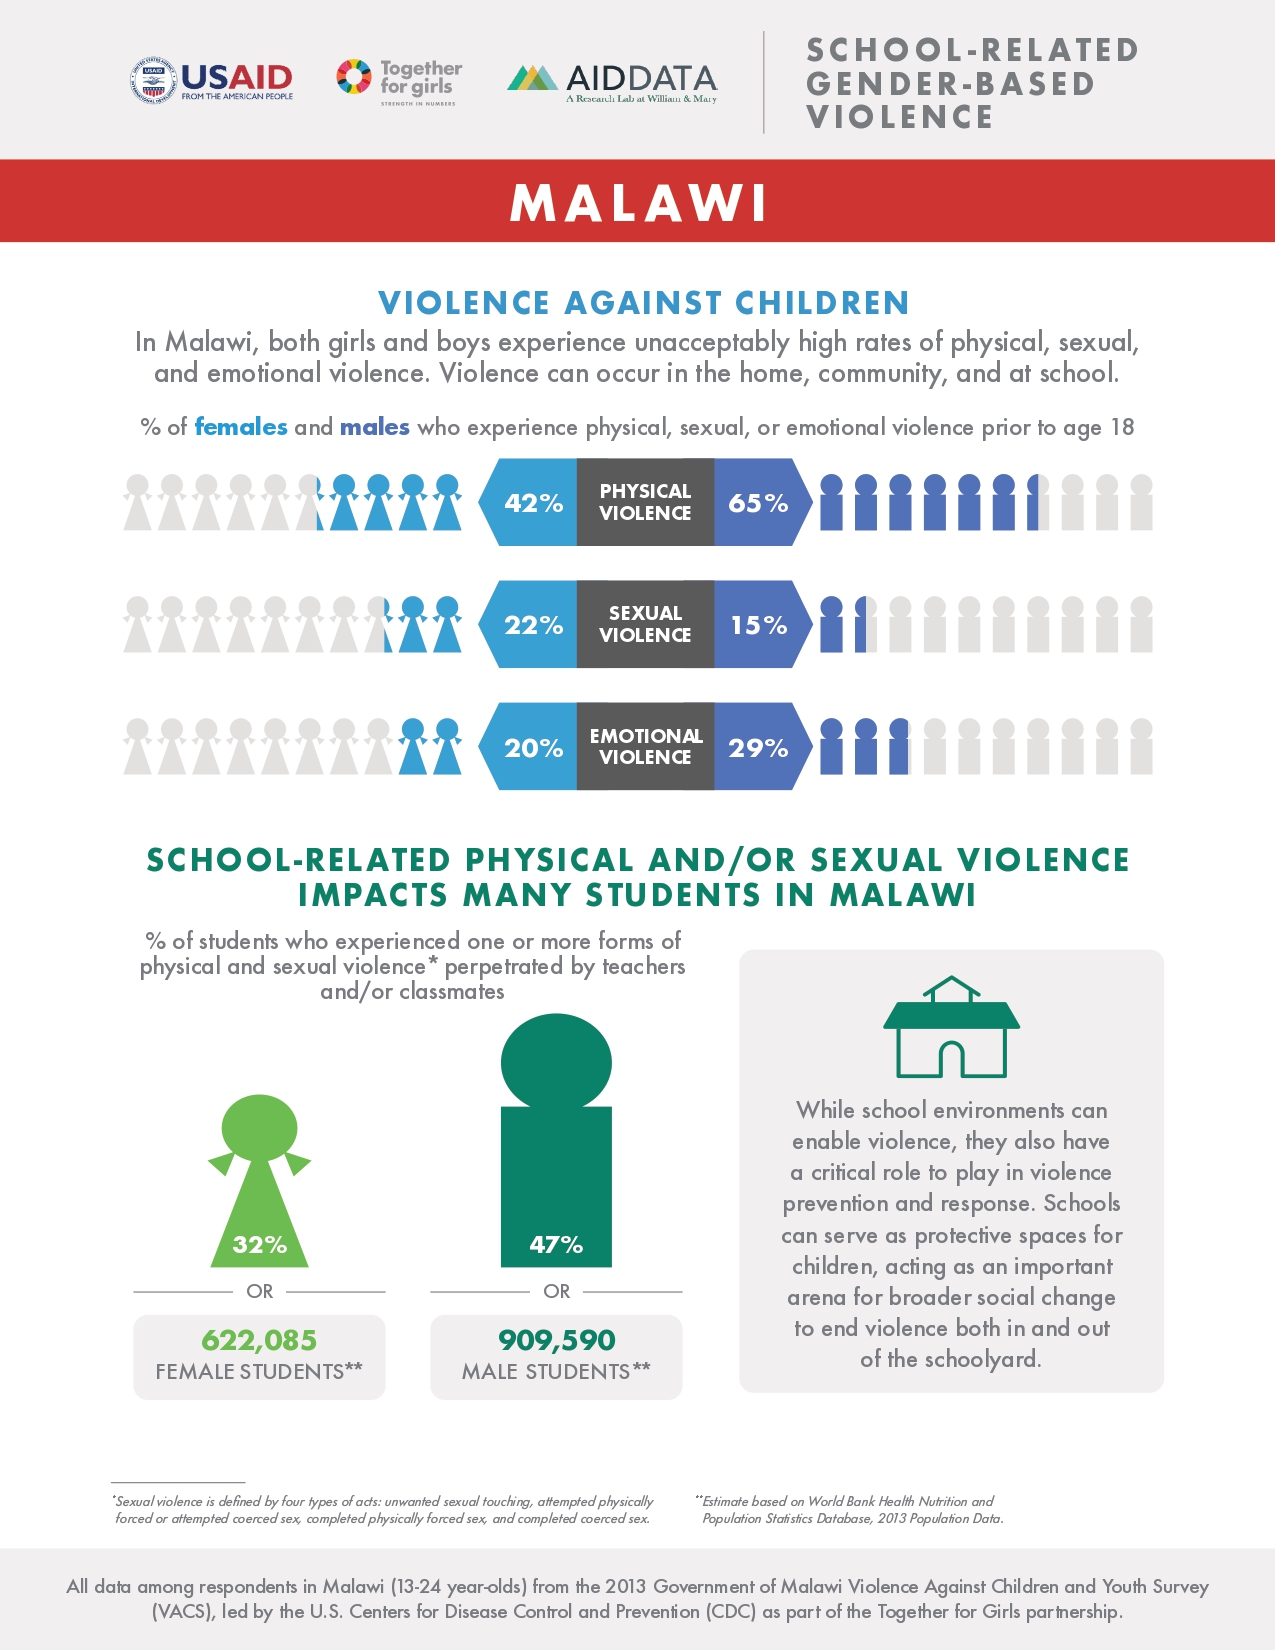 Malawi fact sheet: School-Related Gender-Based Violence